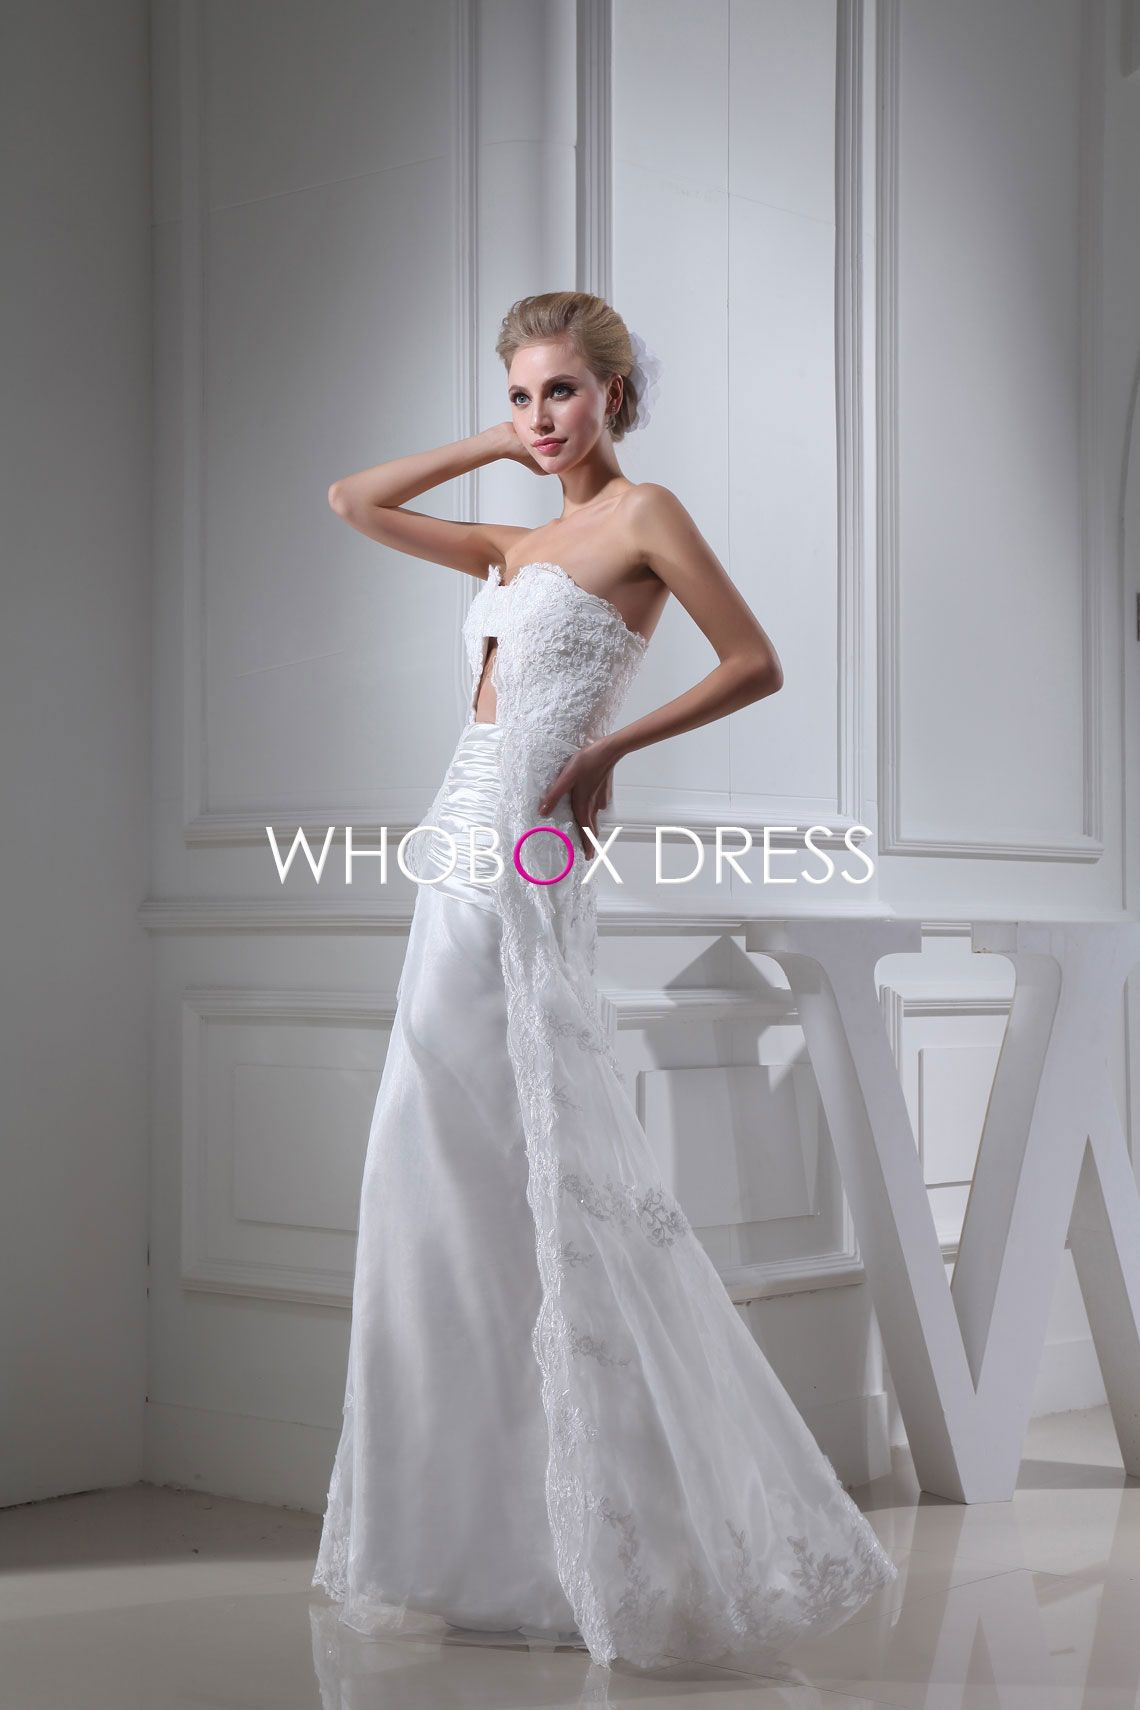 Simple wedding dress wedding ideas pinterest simple weddings